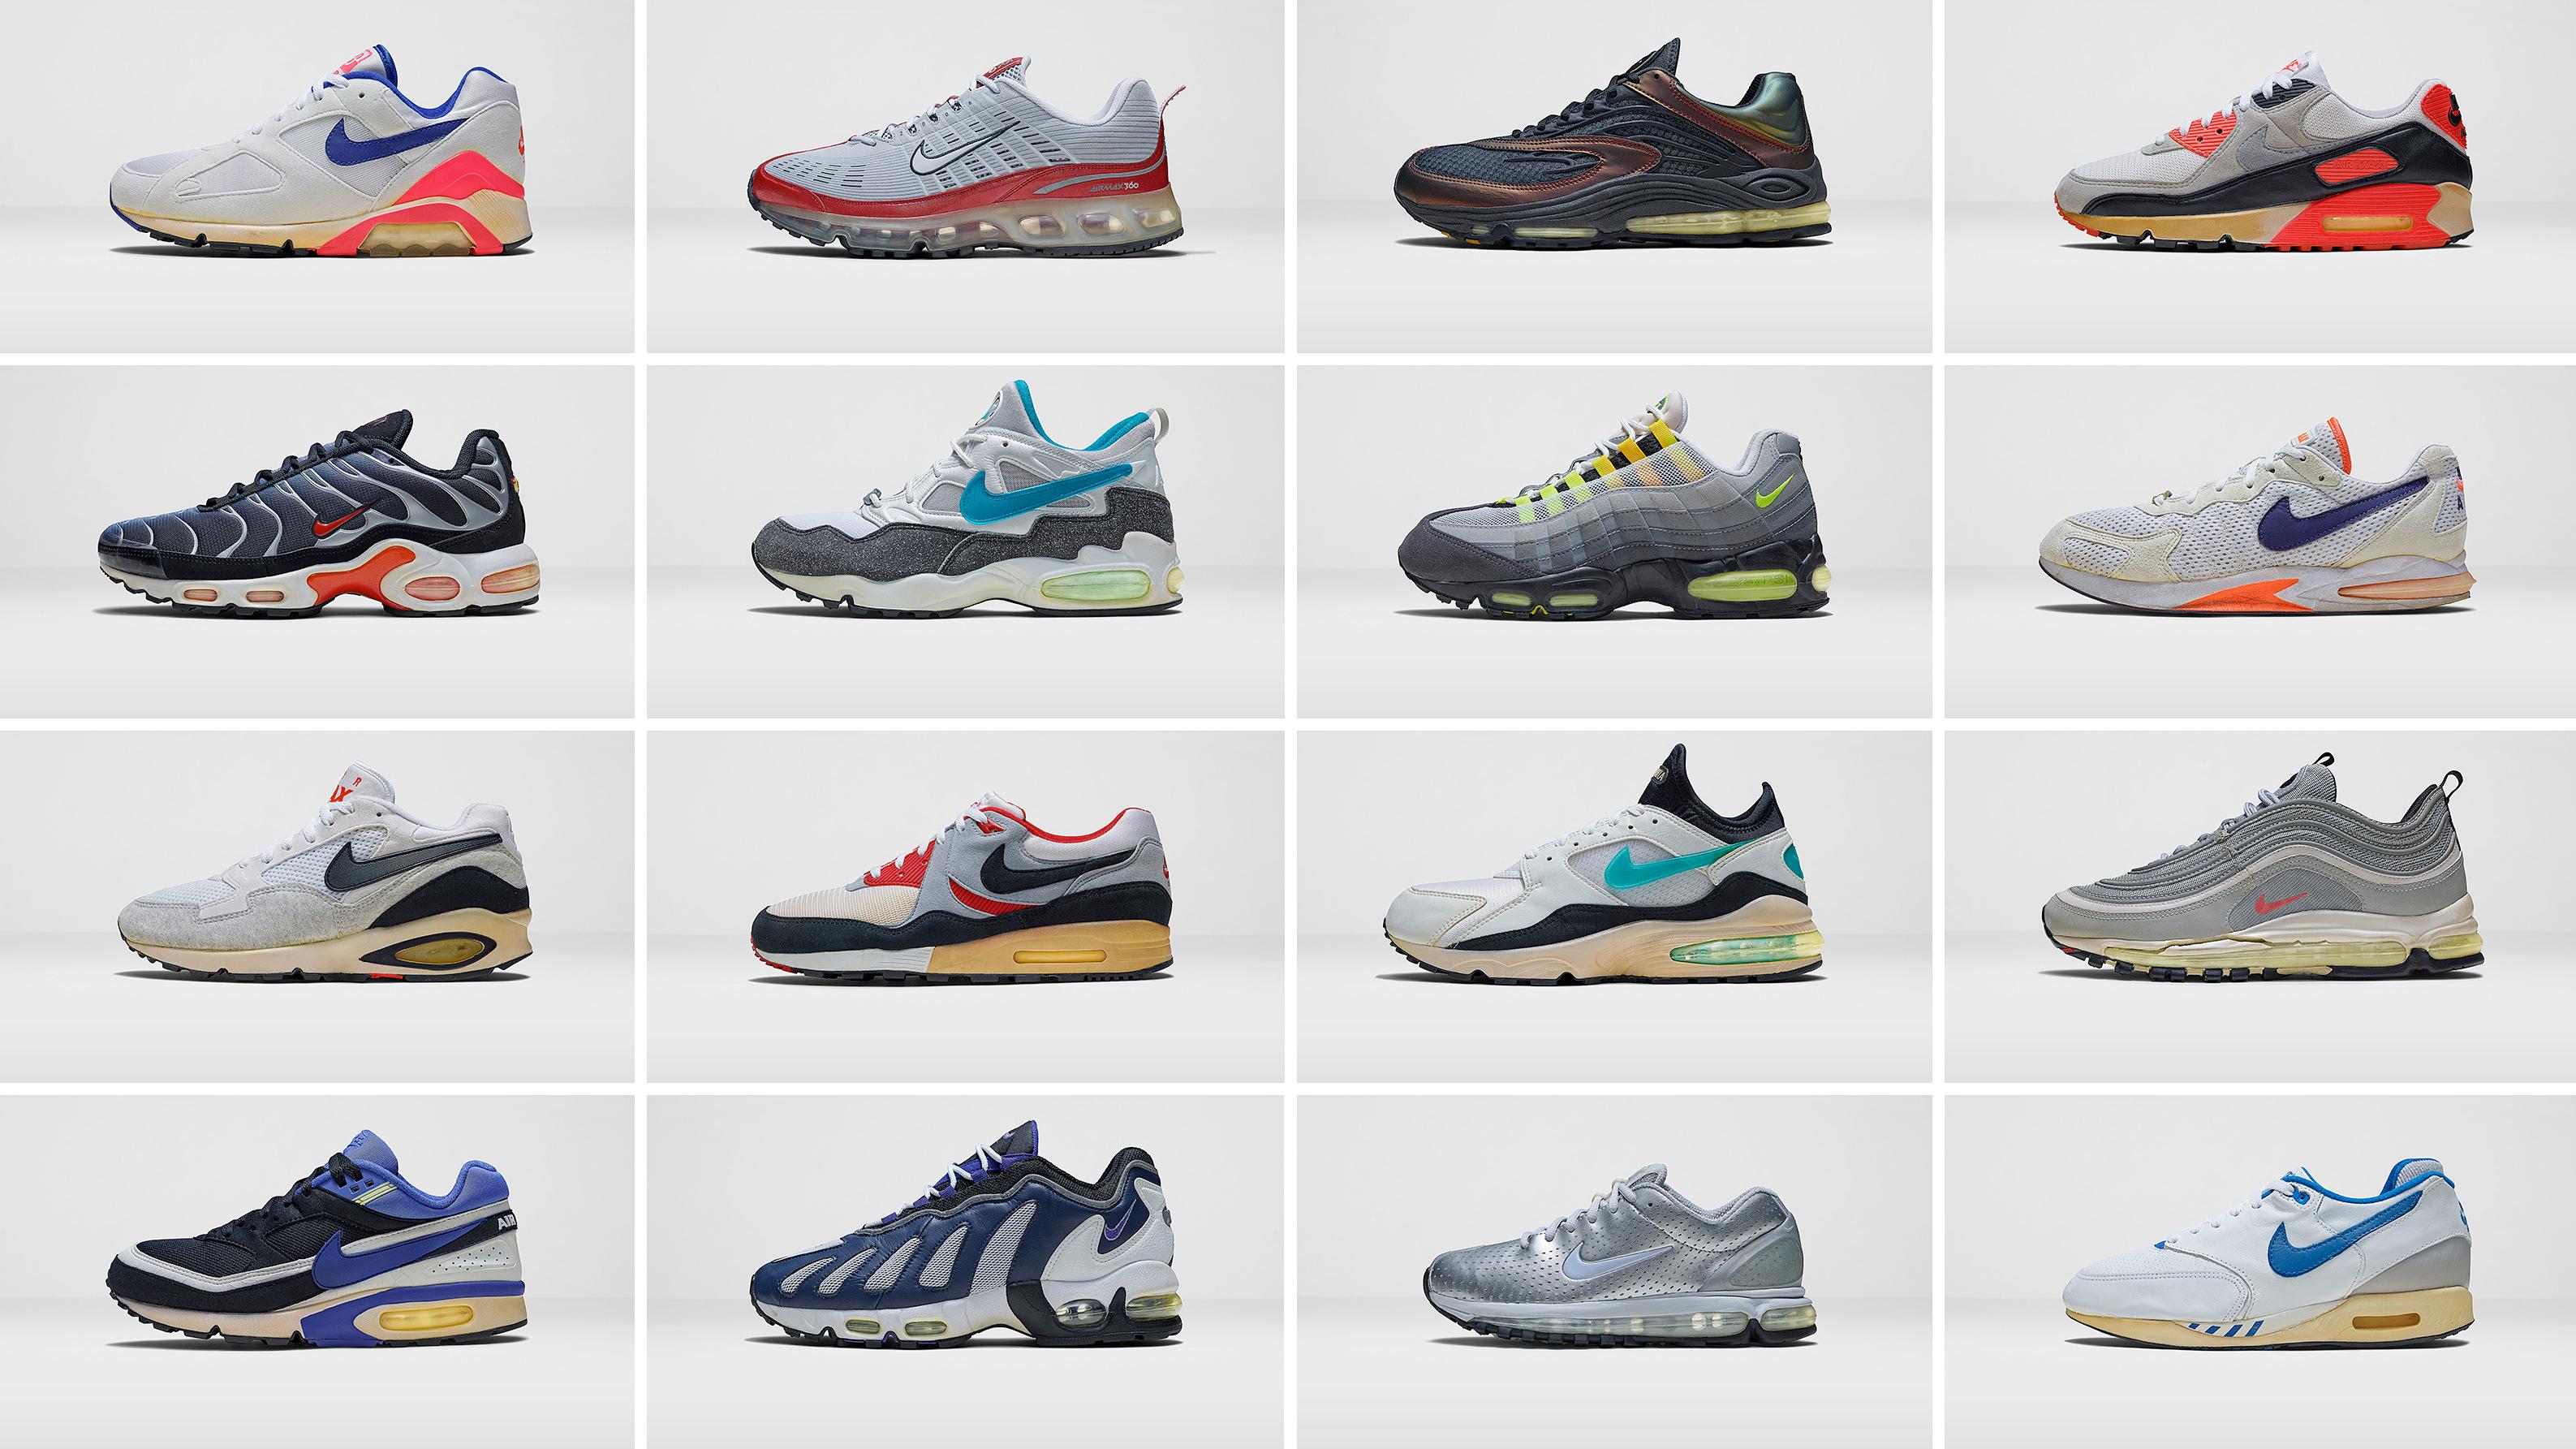 Nike Air Max Archives  1987 to 2006 - OG EUKicks Sneaker Magazine 0bfa1b286d61